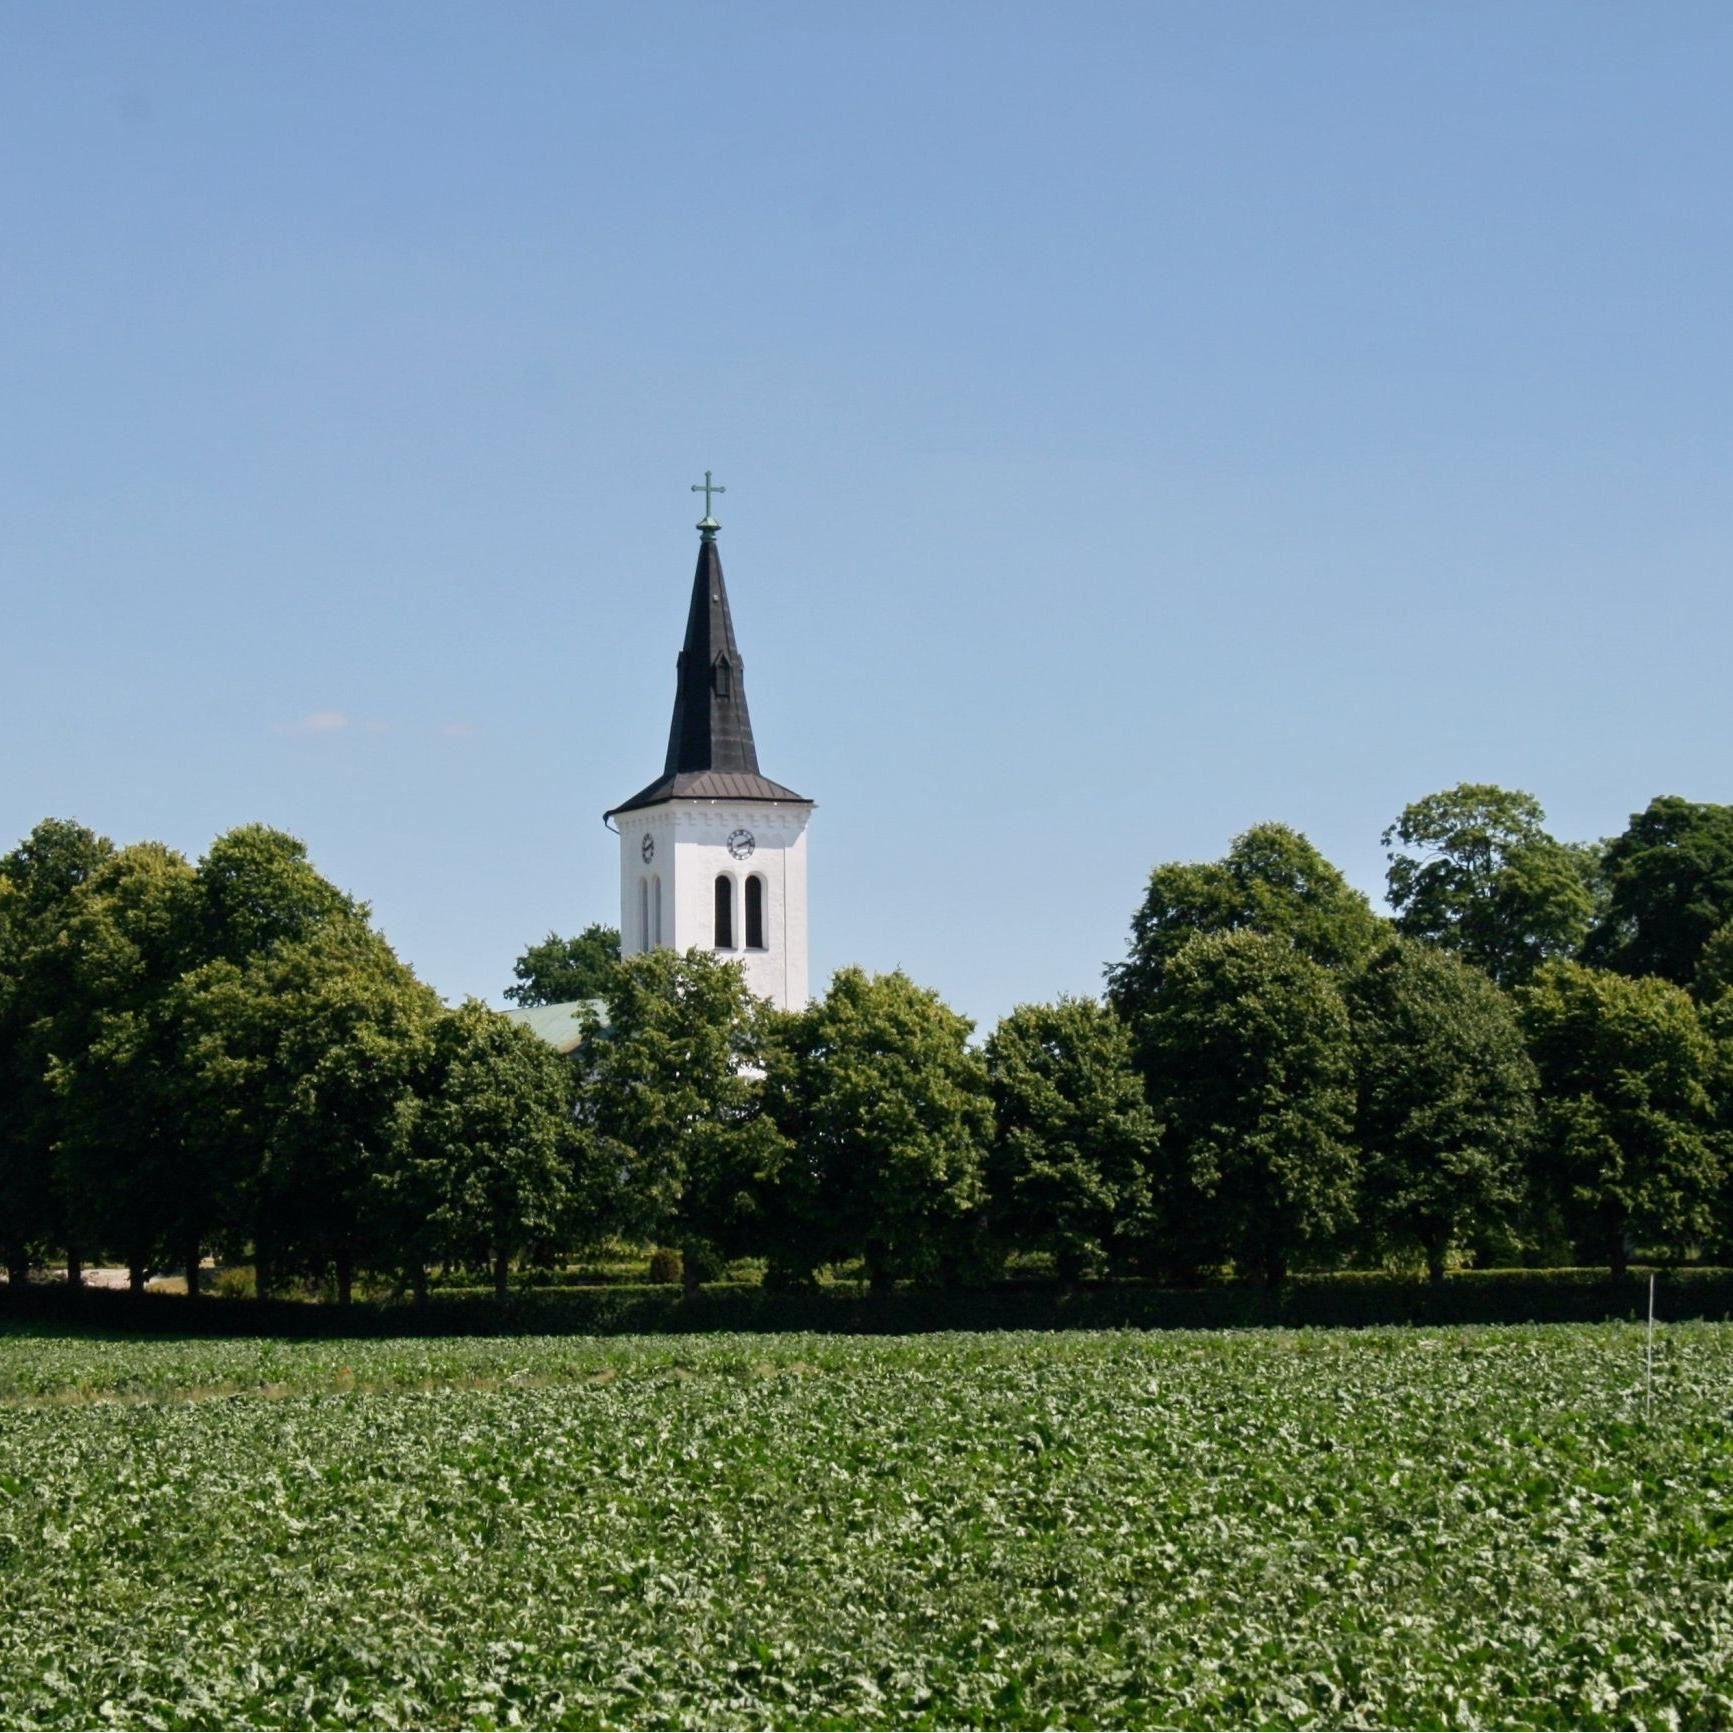 © Kävlinge kommun, Södervidinge kyrka